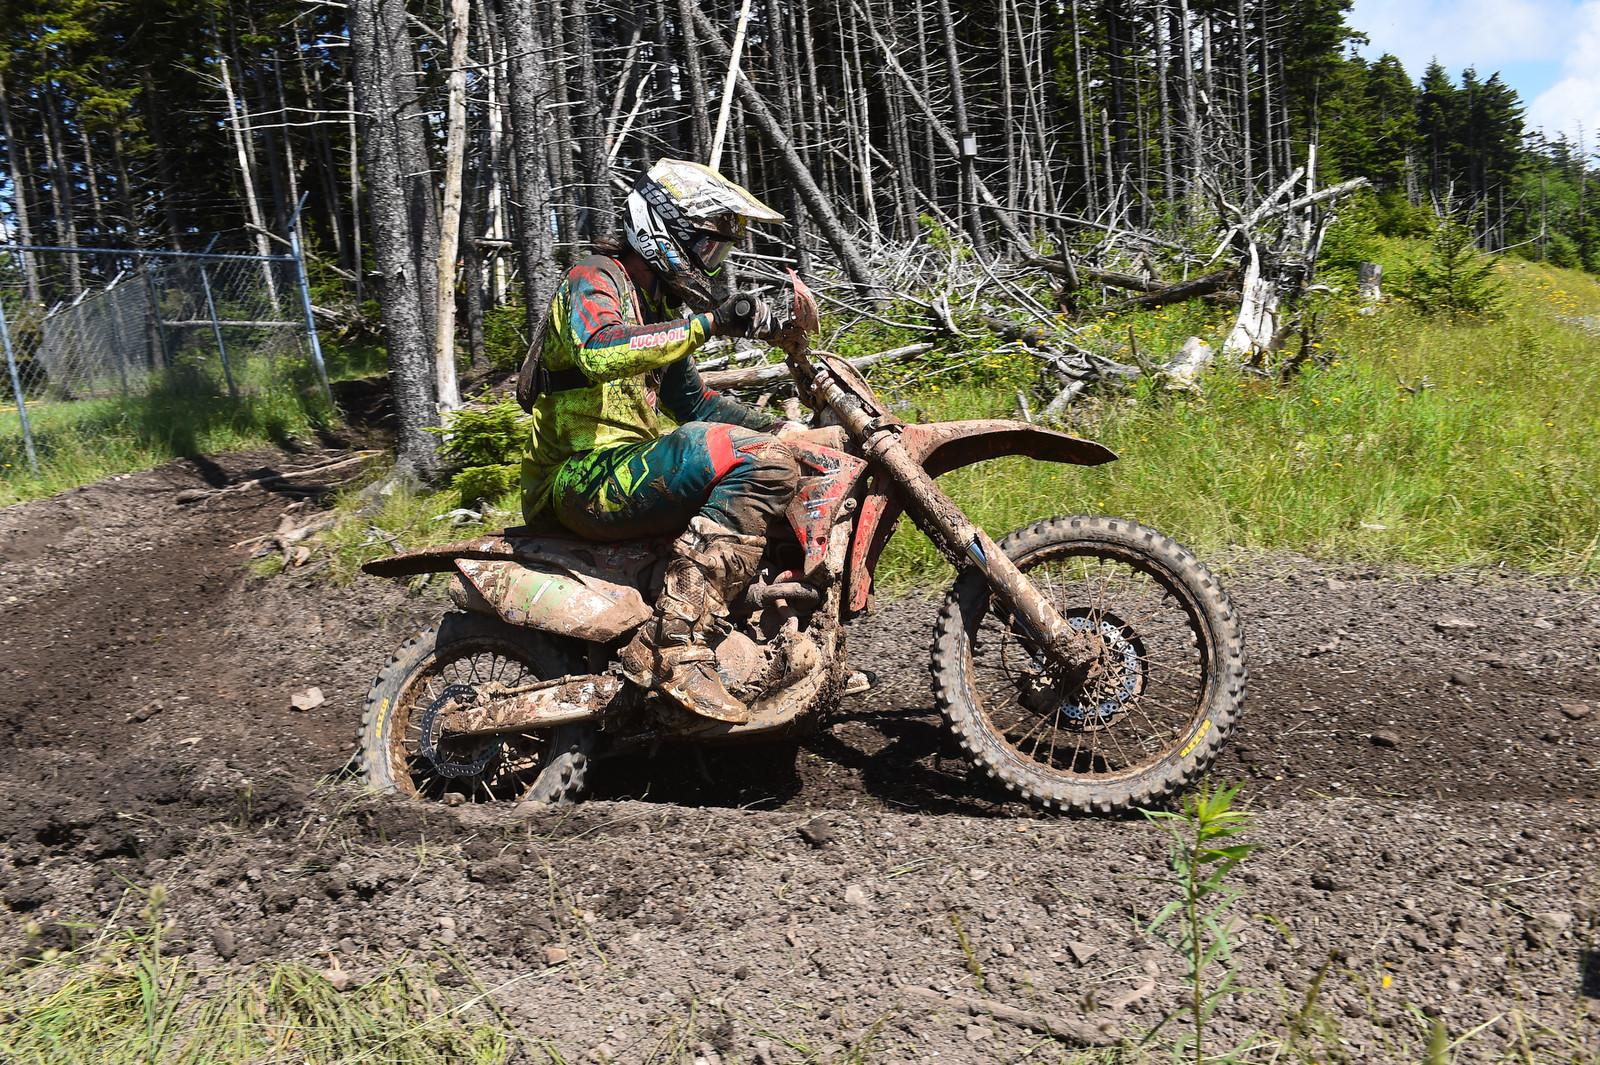 Trevor Bollinger - Snowshoe GNCC - Motocross Pictures - Vital MX